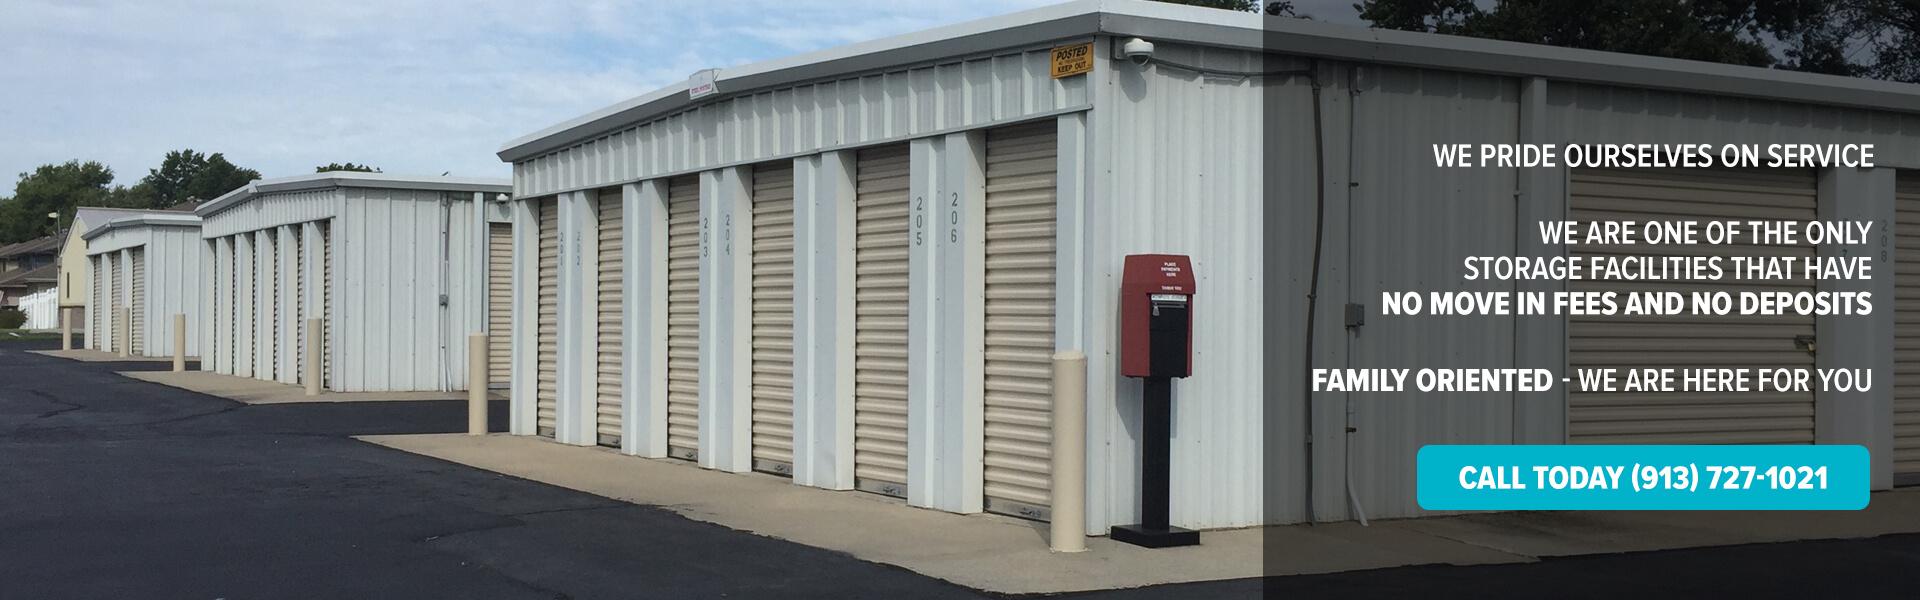 367 & Storage Unit Company in Lansing KS | Storage Unit Facility